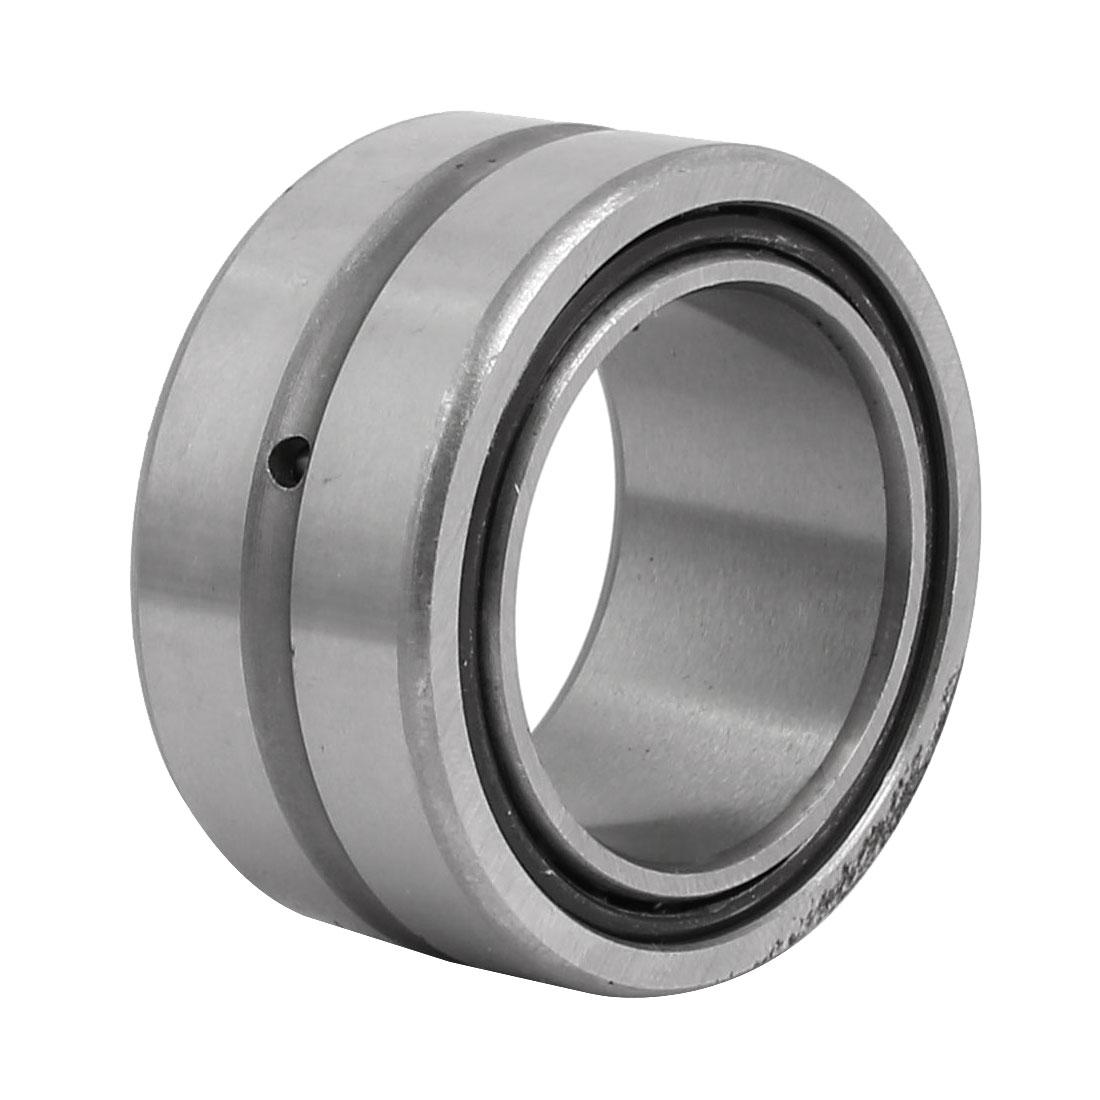 NKI28/20 28mmx42mmx20mm Inner Ring Needle Roller Bearing Silver Tone